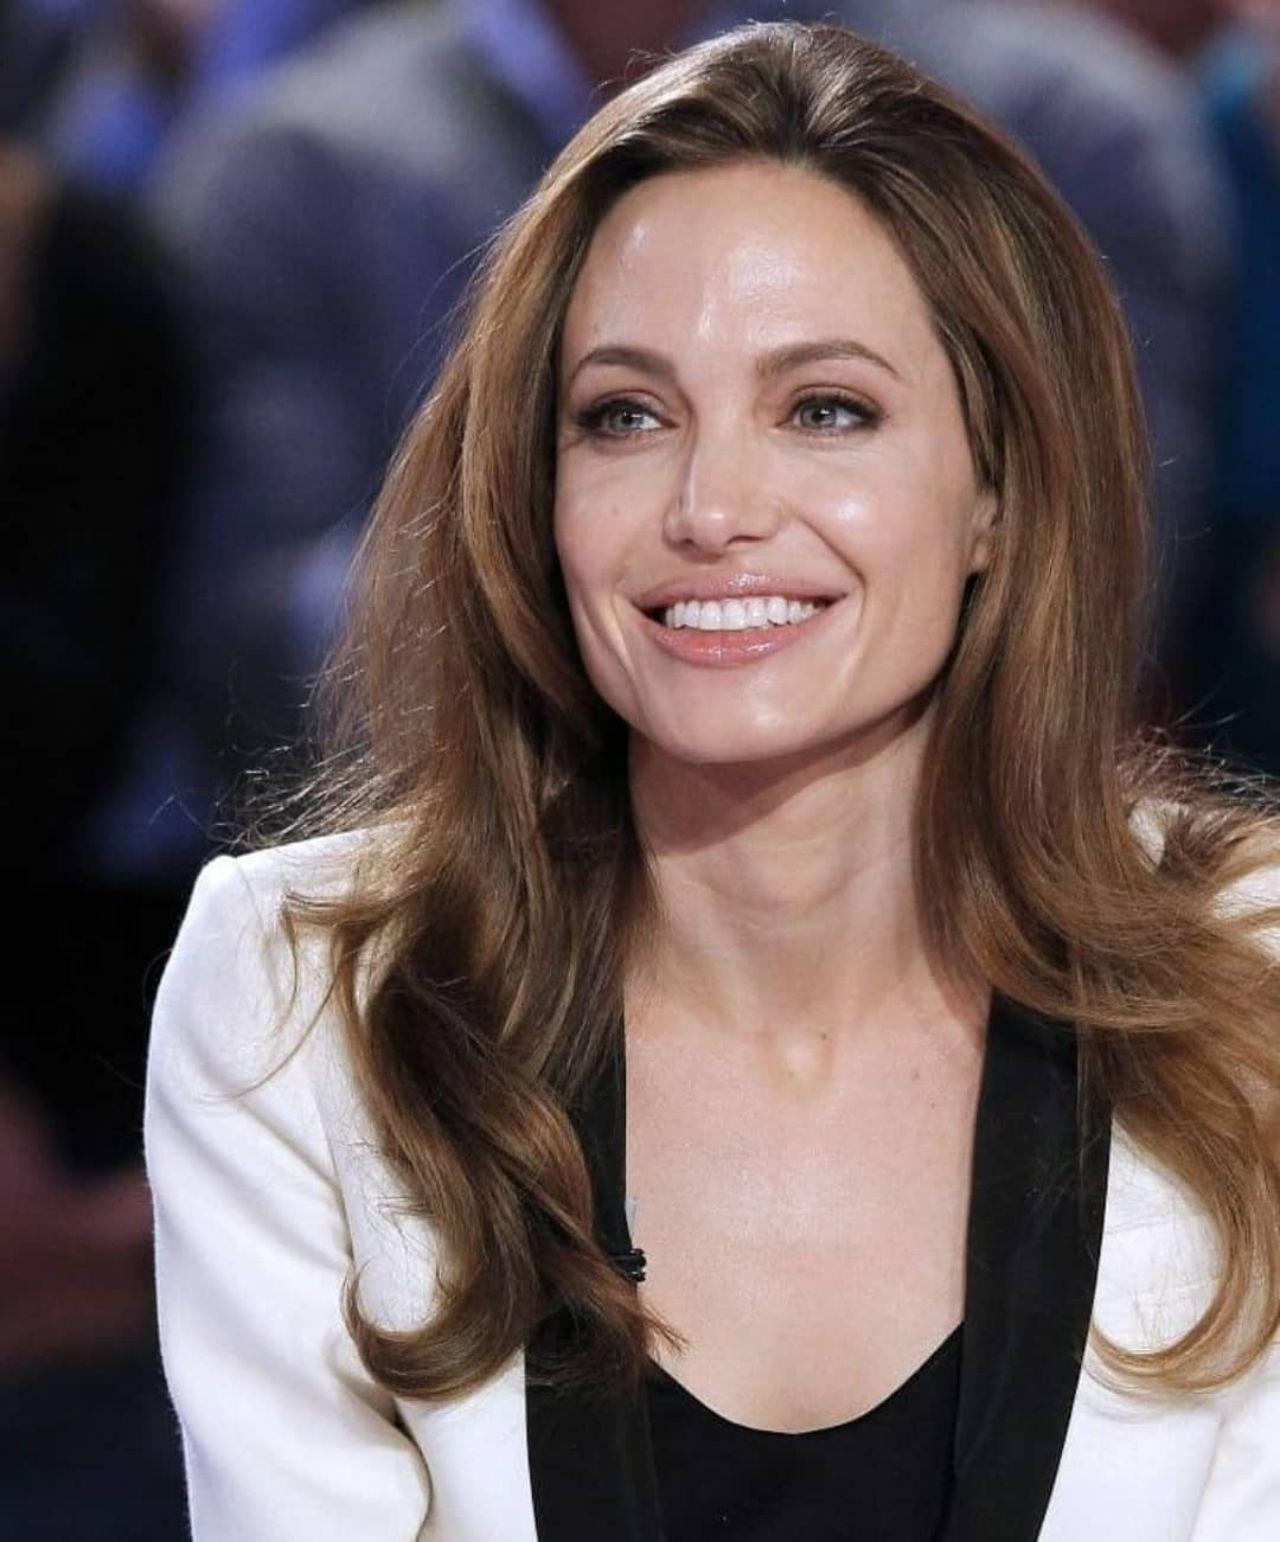 Angelina Jolie impacta con nuevo look radical